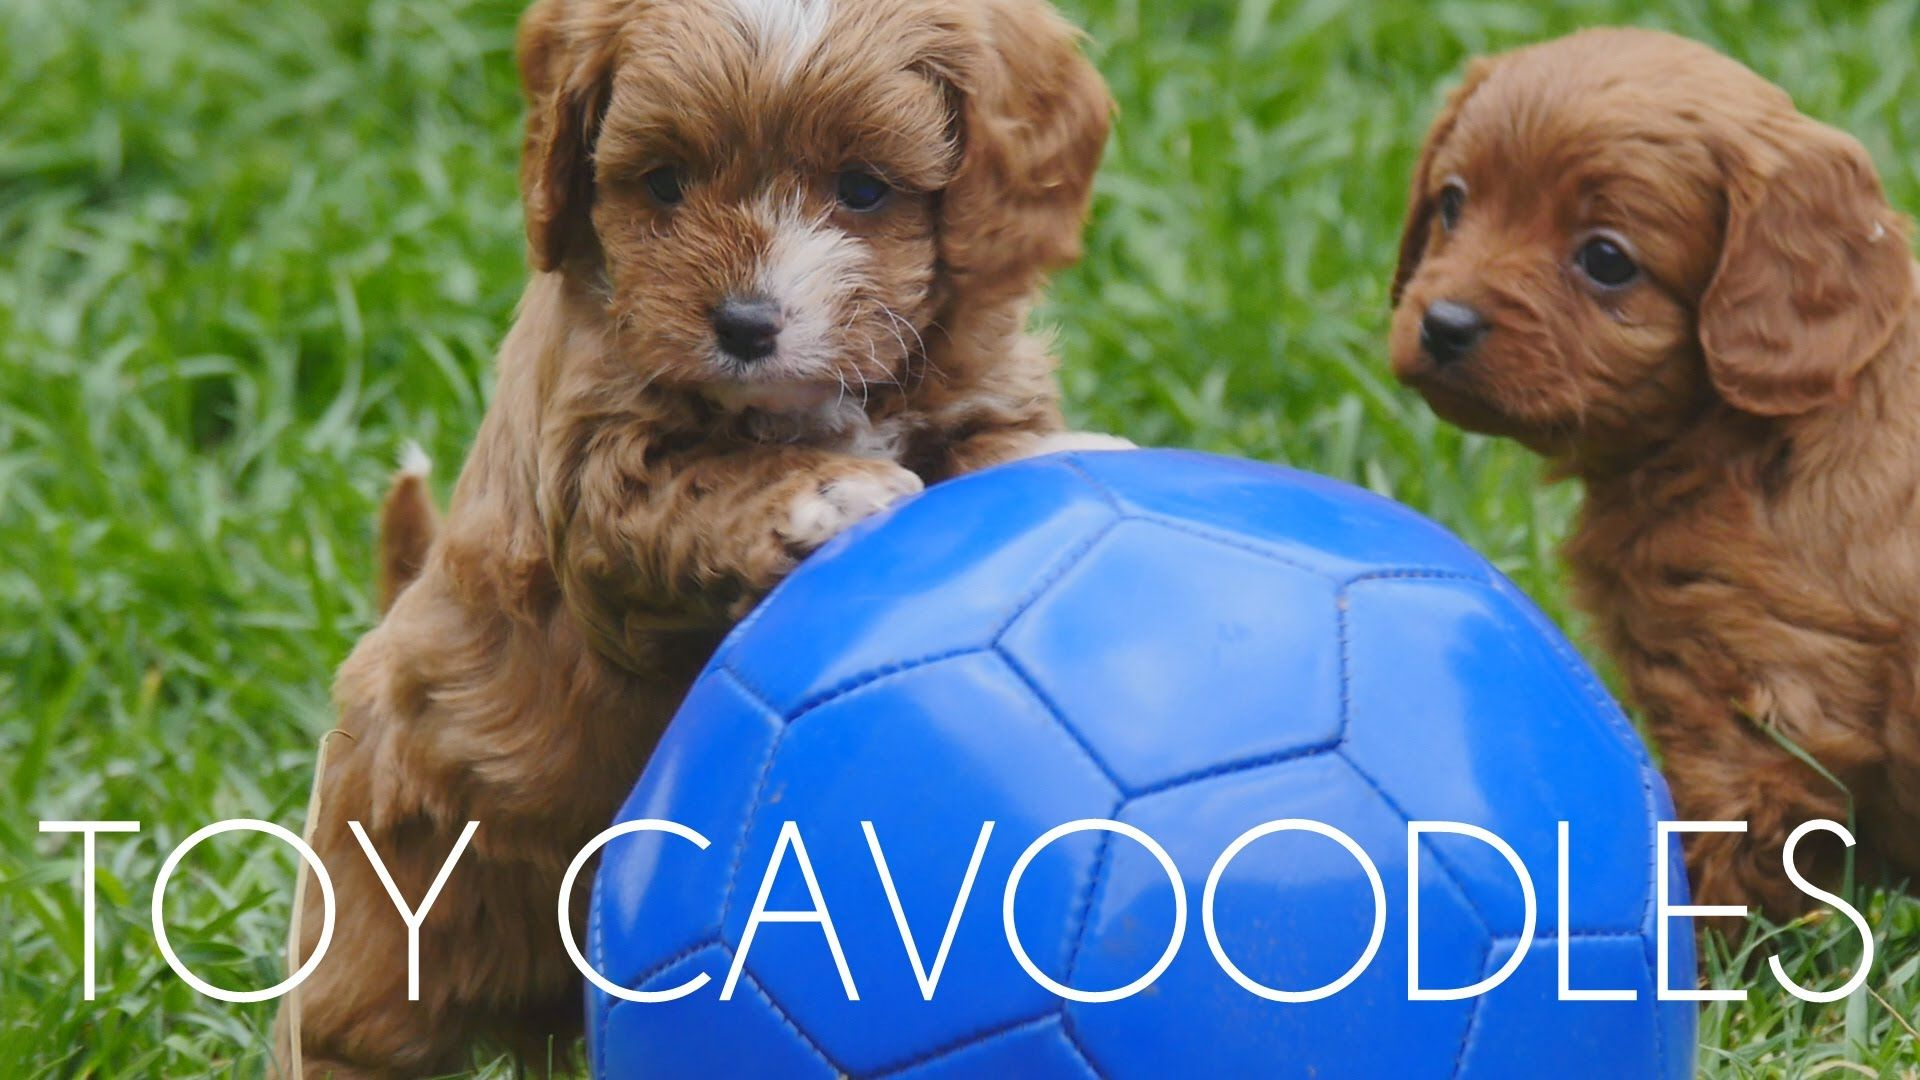 Chevromist Cavoodle Puppies May 2015 Cavalier King Charles Dog King Charles Dog Cavalier King Charles Spaniel